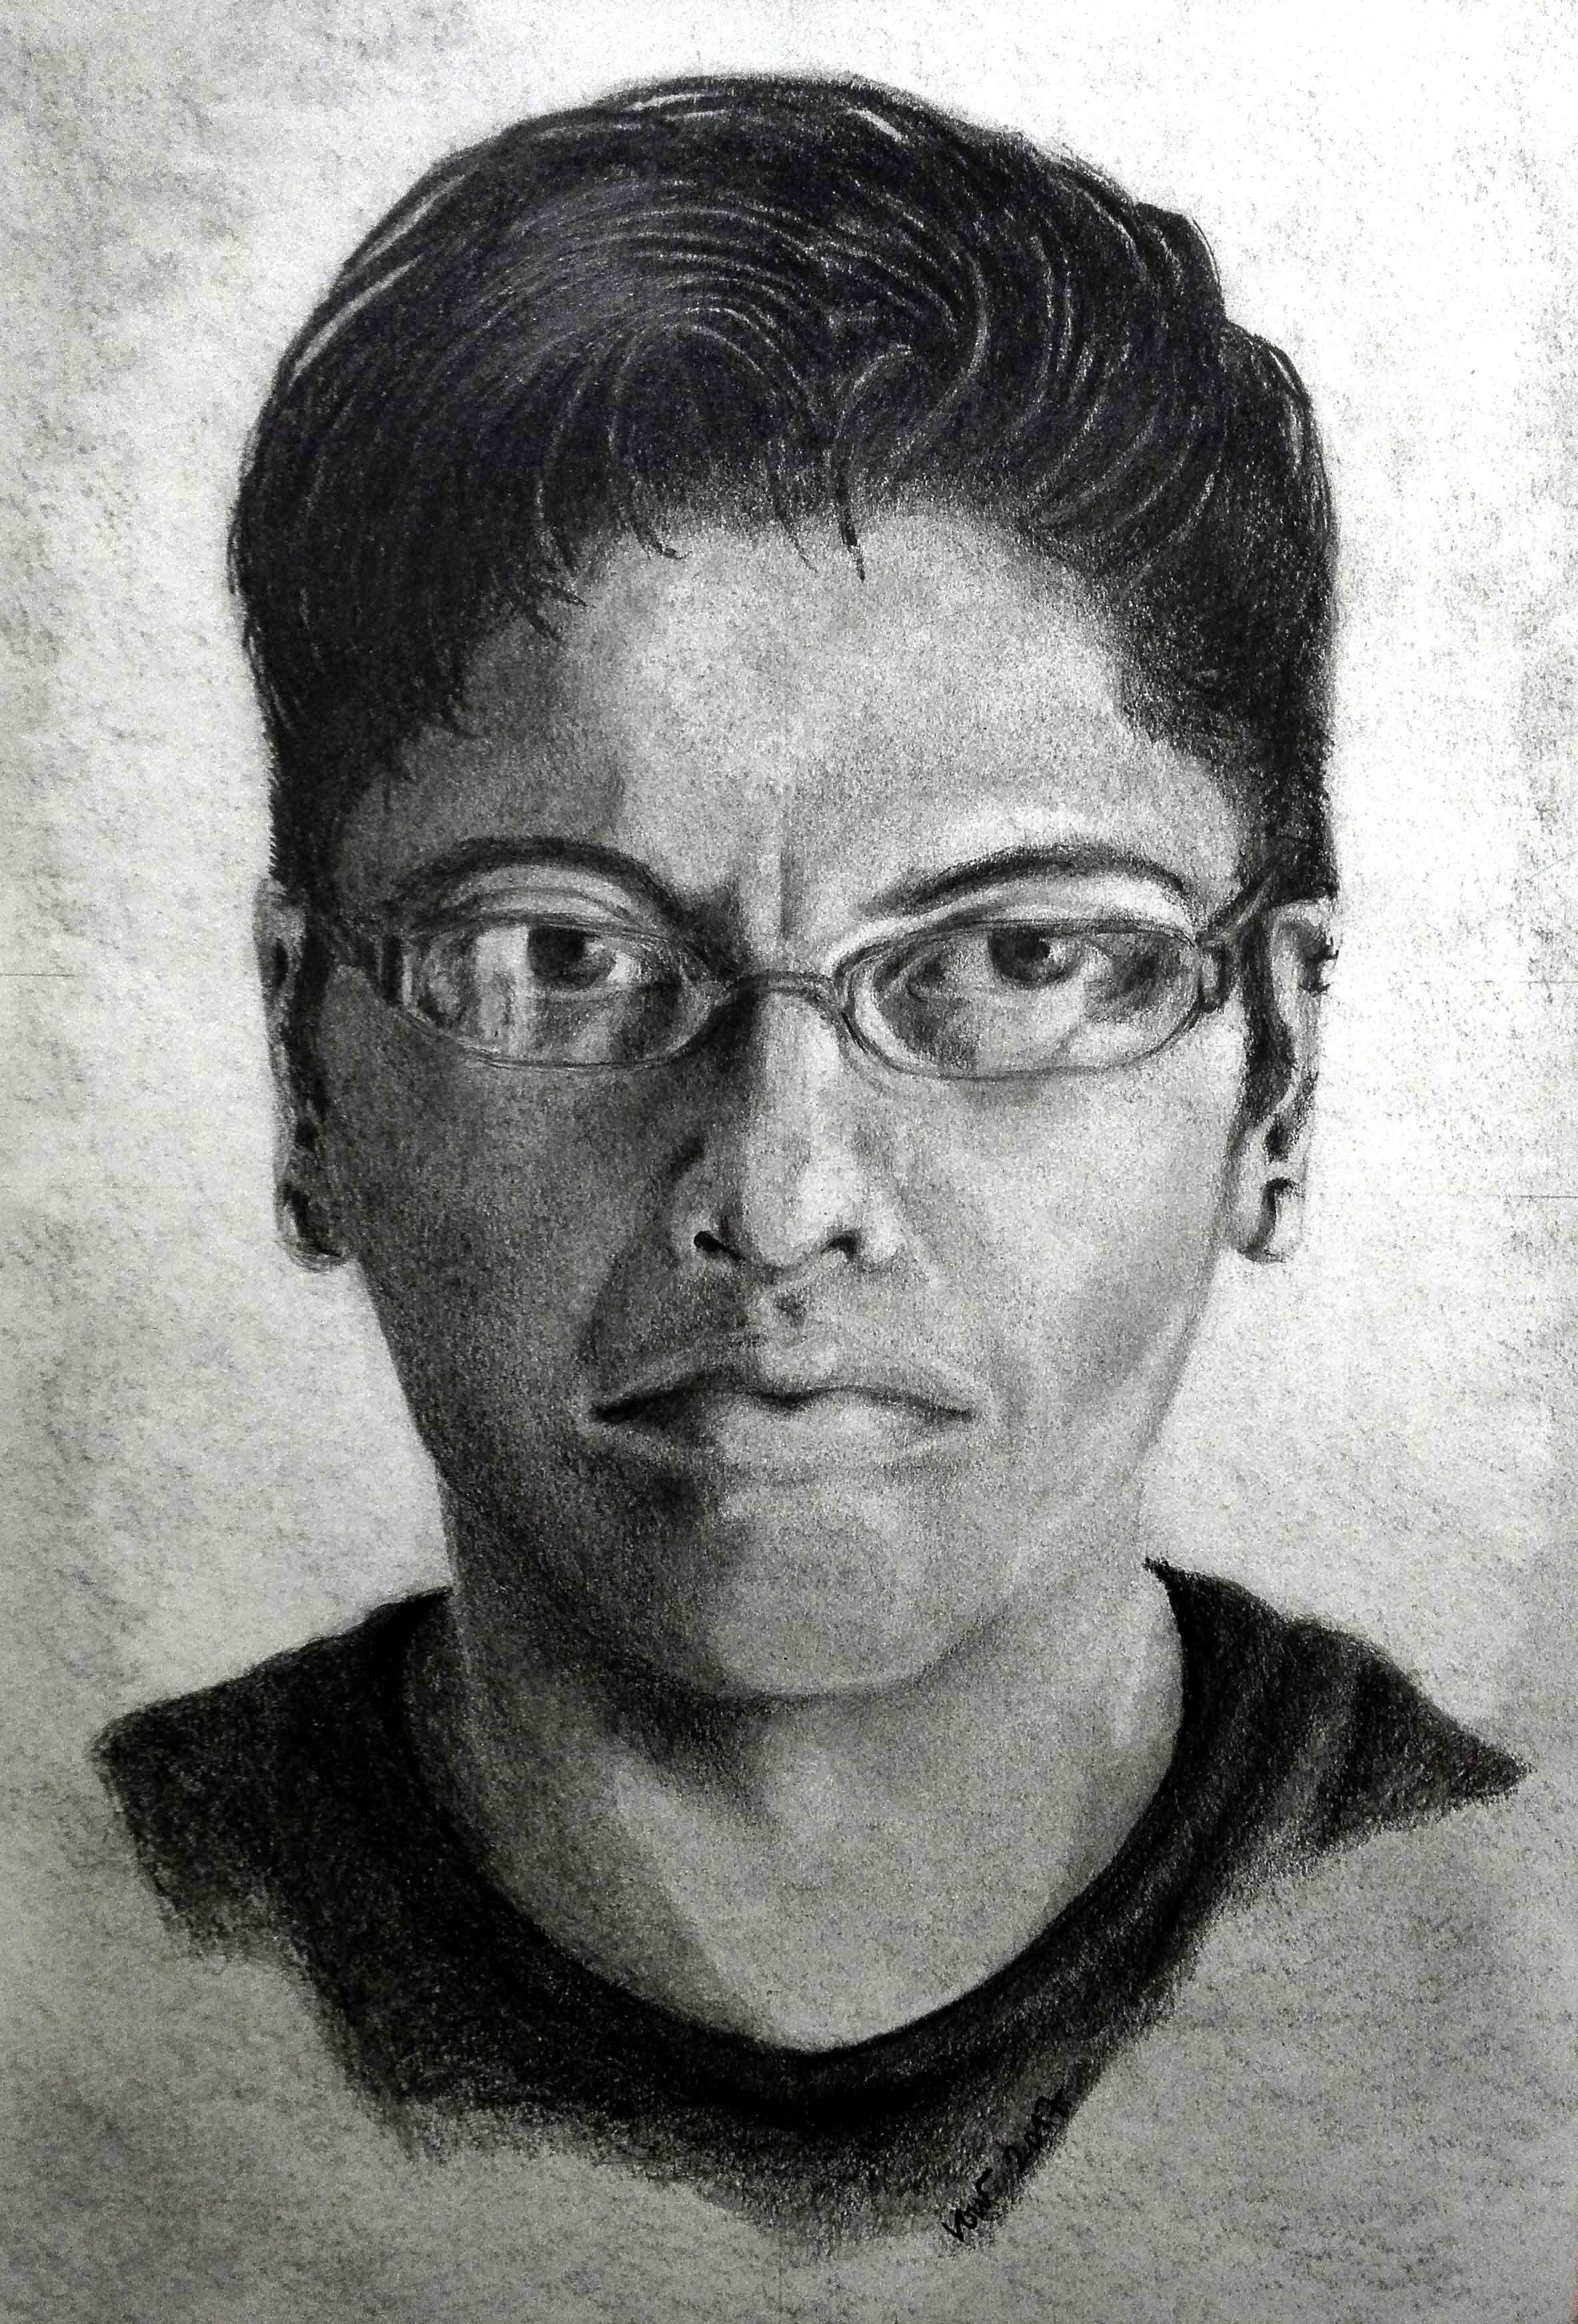 Retrato de Guadalupe por Lorena (lápiz)